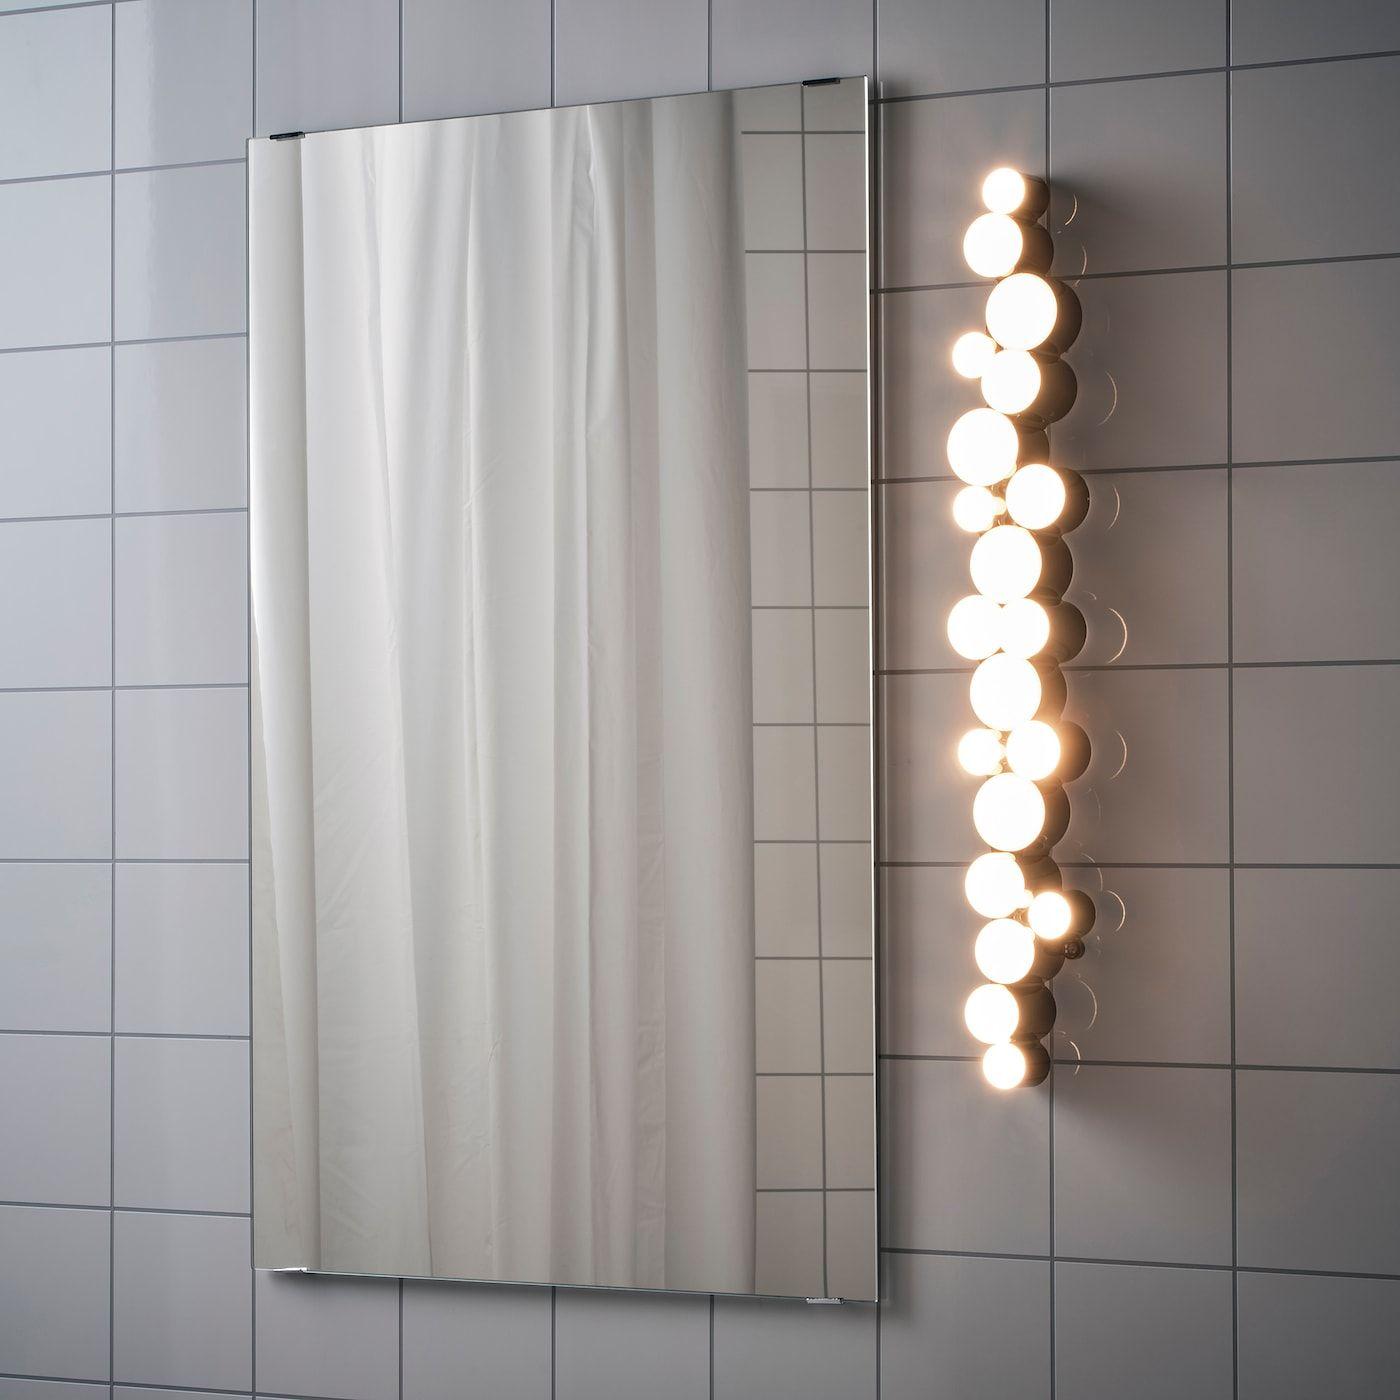 Sodersvik Wandleuchte Led Schwarz Verchromt Ikea Osterreich In 2020 Led Wall Lamp Black Wall Lamps Wall Lamp